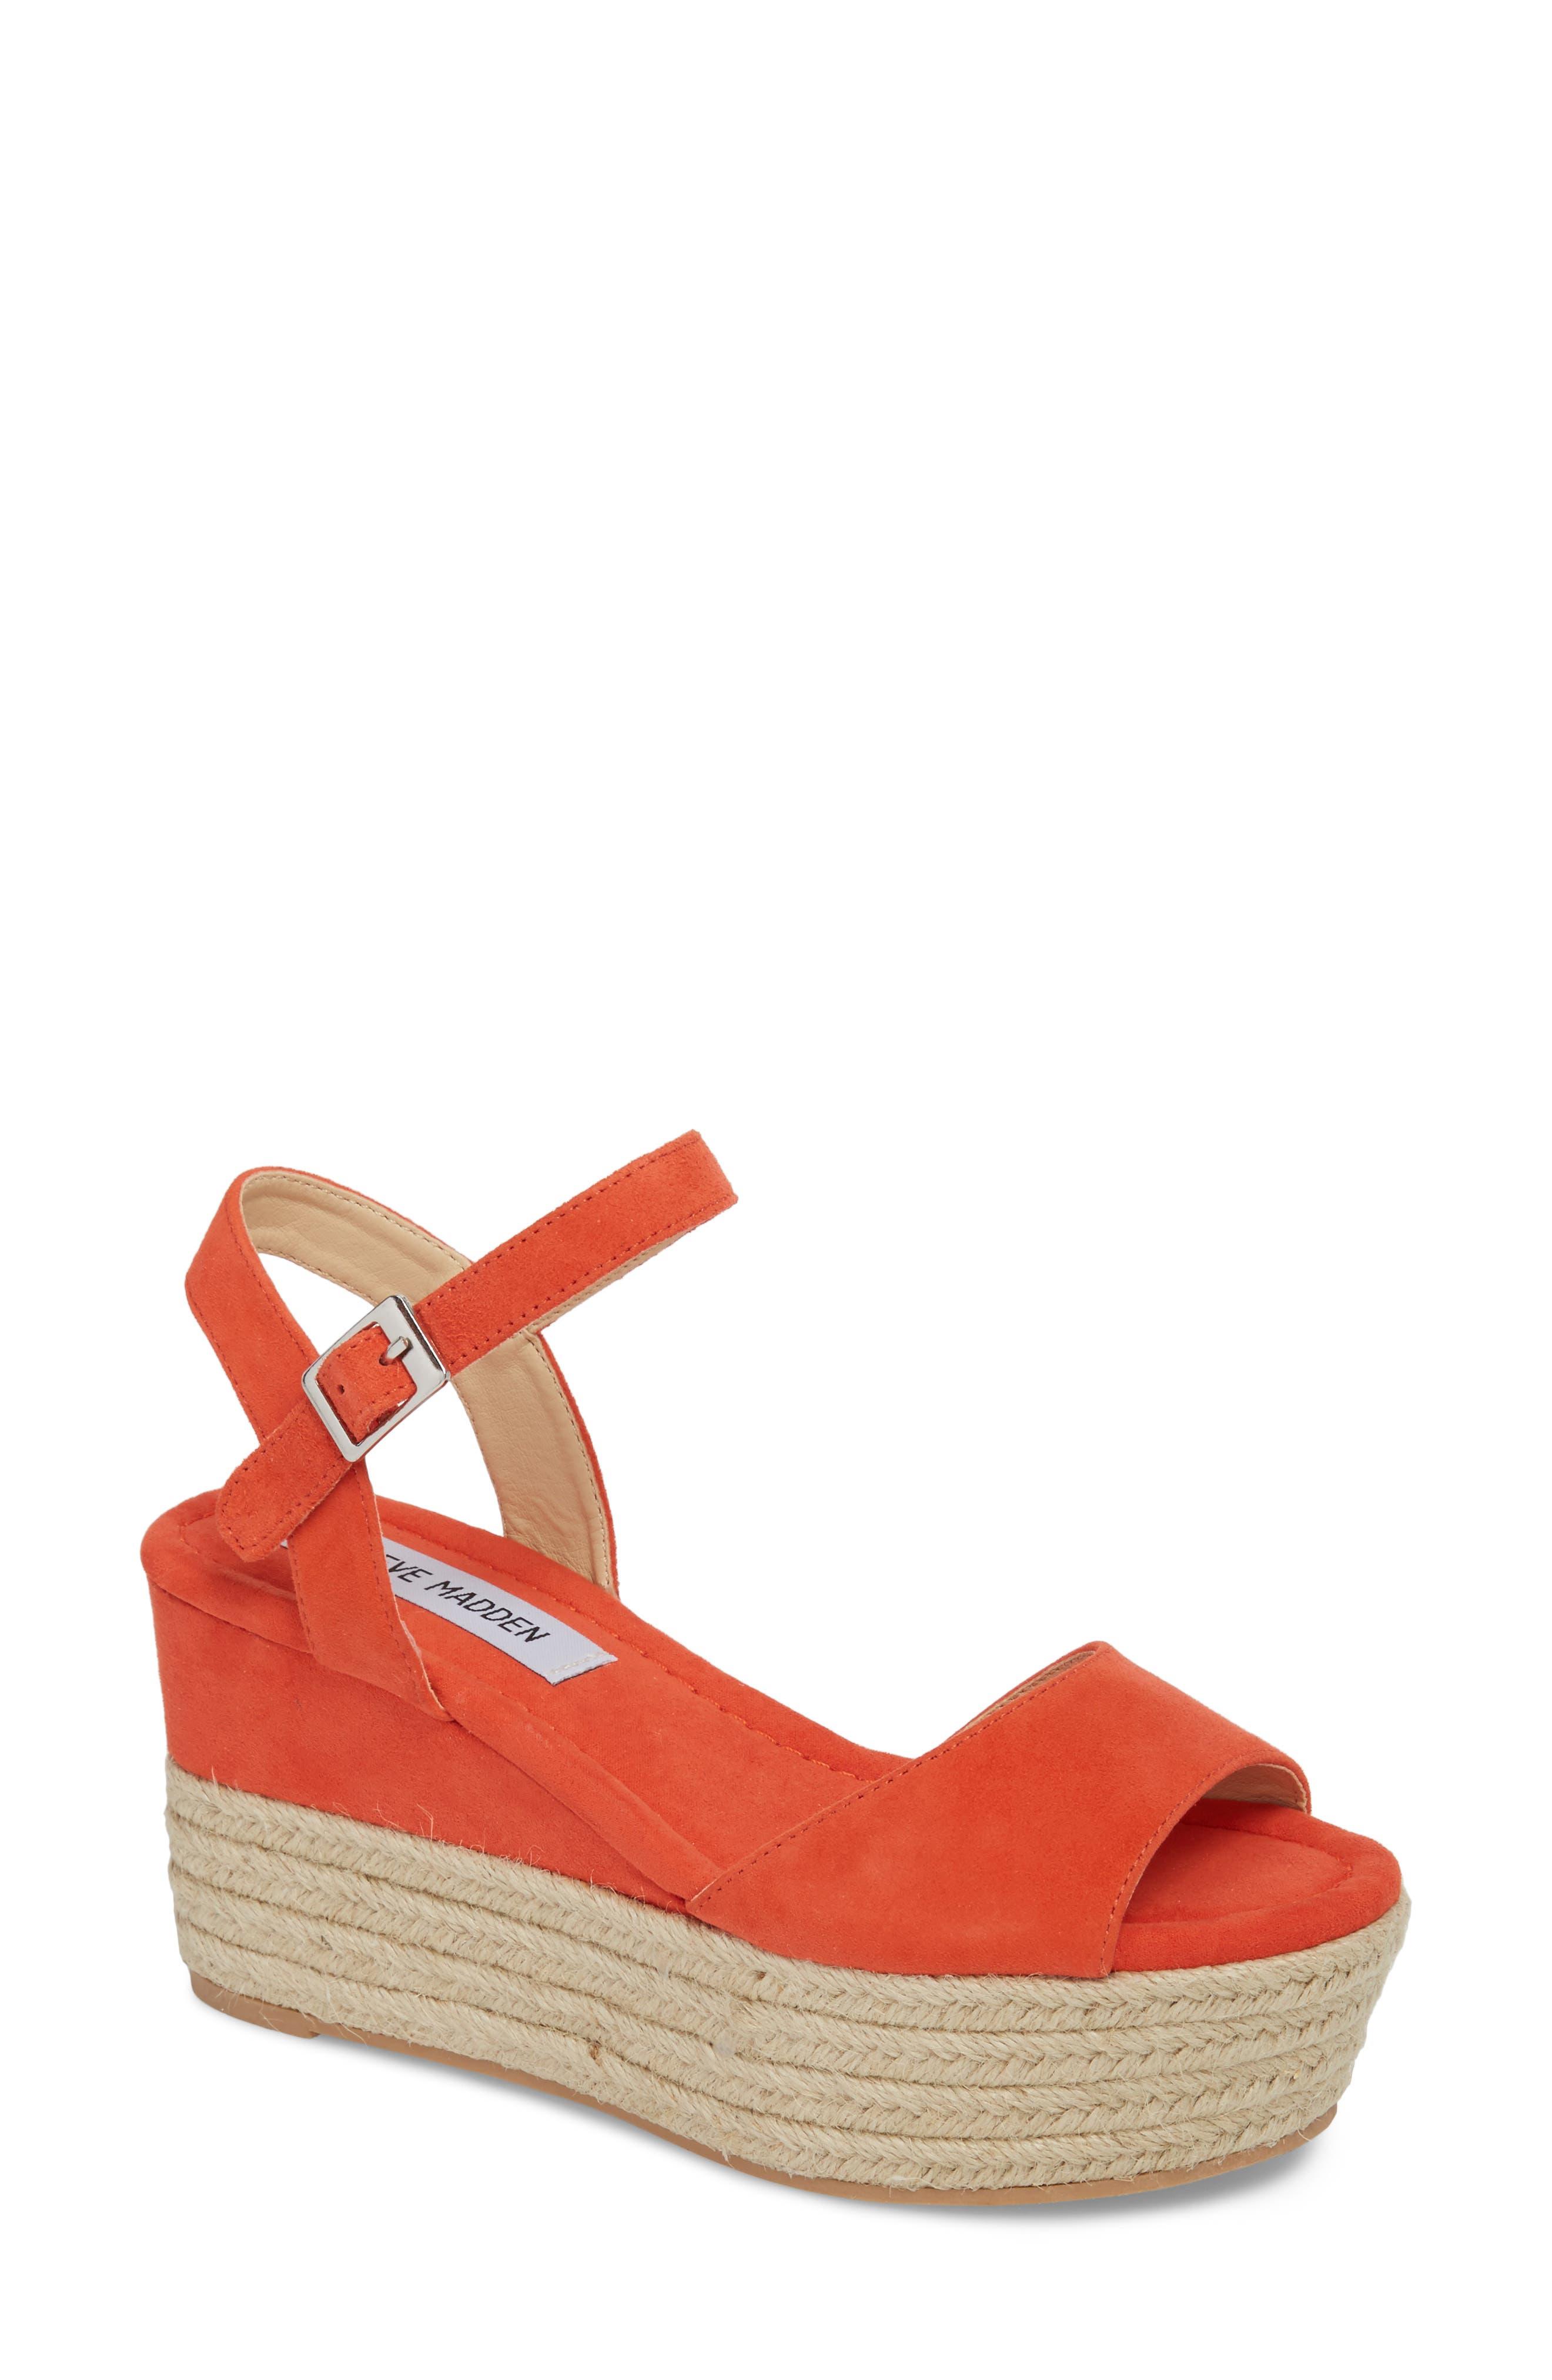 Kianna Espadrille Wedge Sandal,                         Main,                         color, CORAL SUEDE